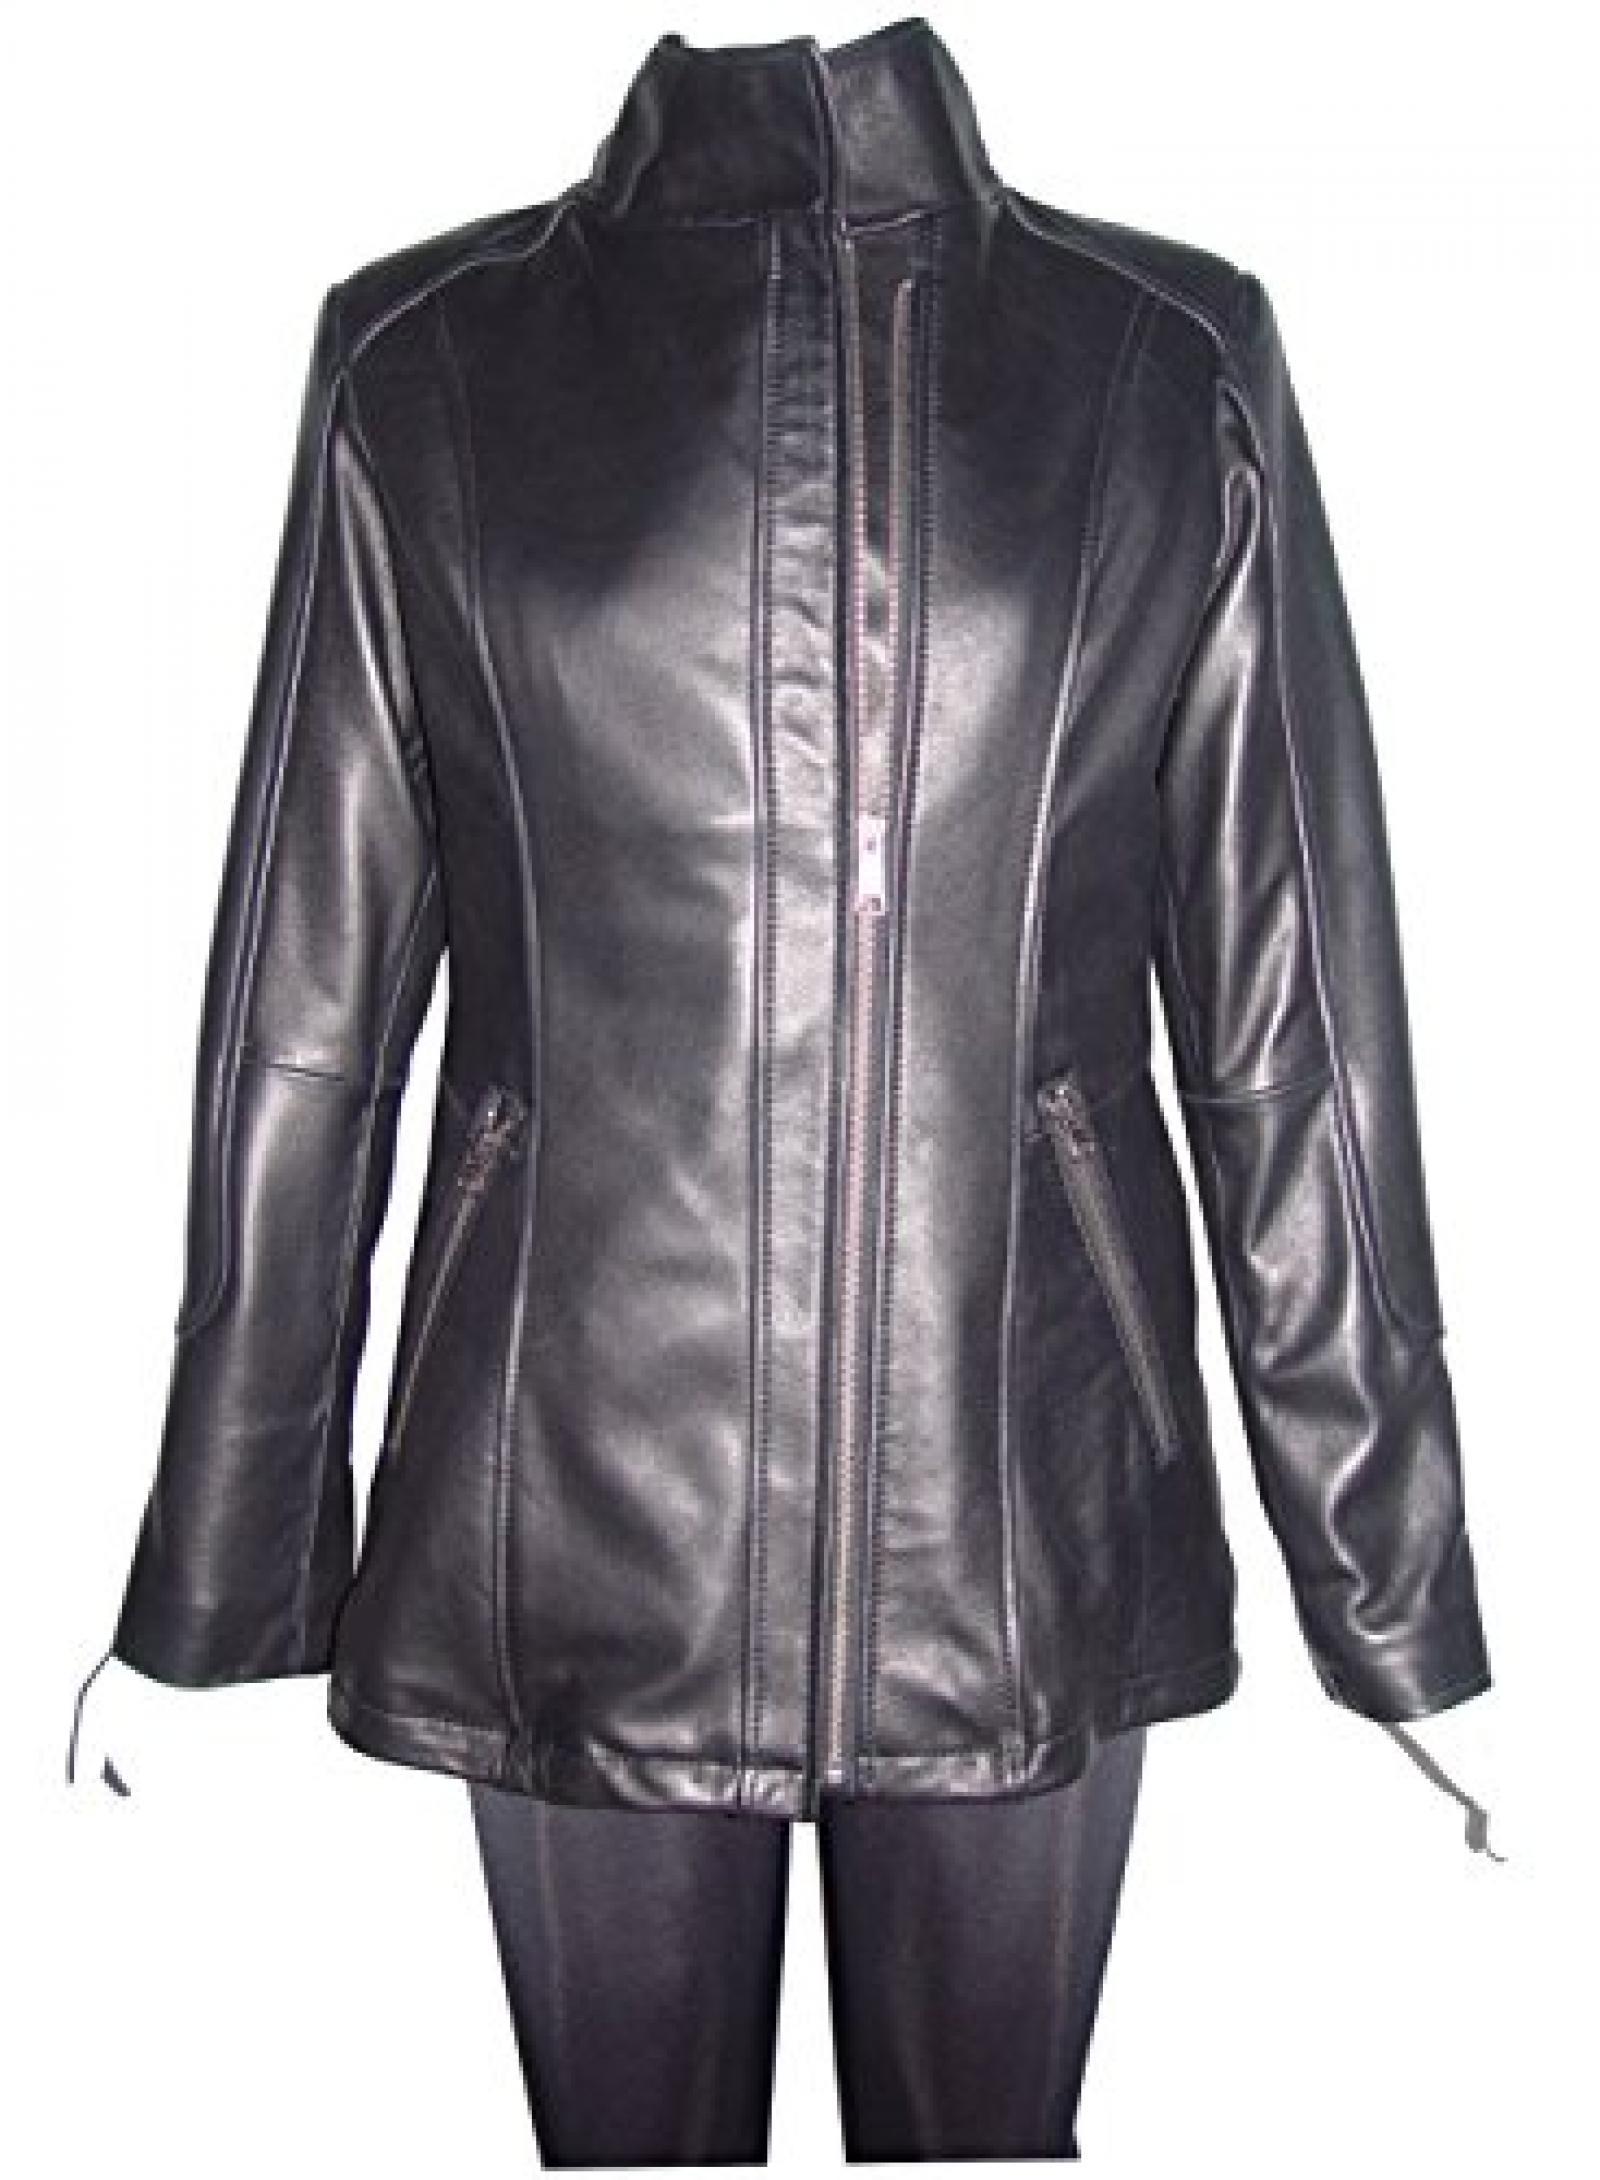 Nettailor Women PLUS SIZE 4197 Soft Leather Casual Moto Jacket Zip Front